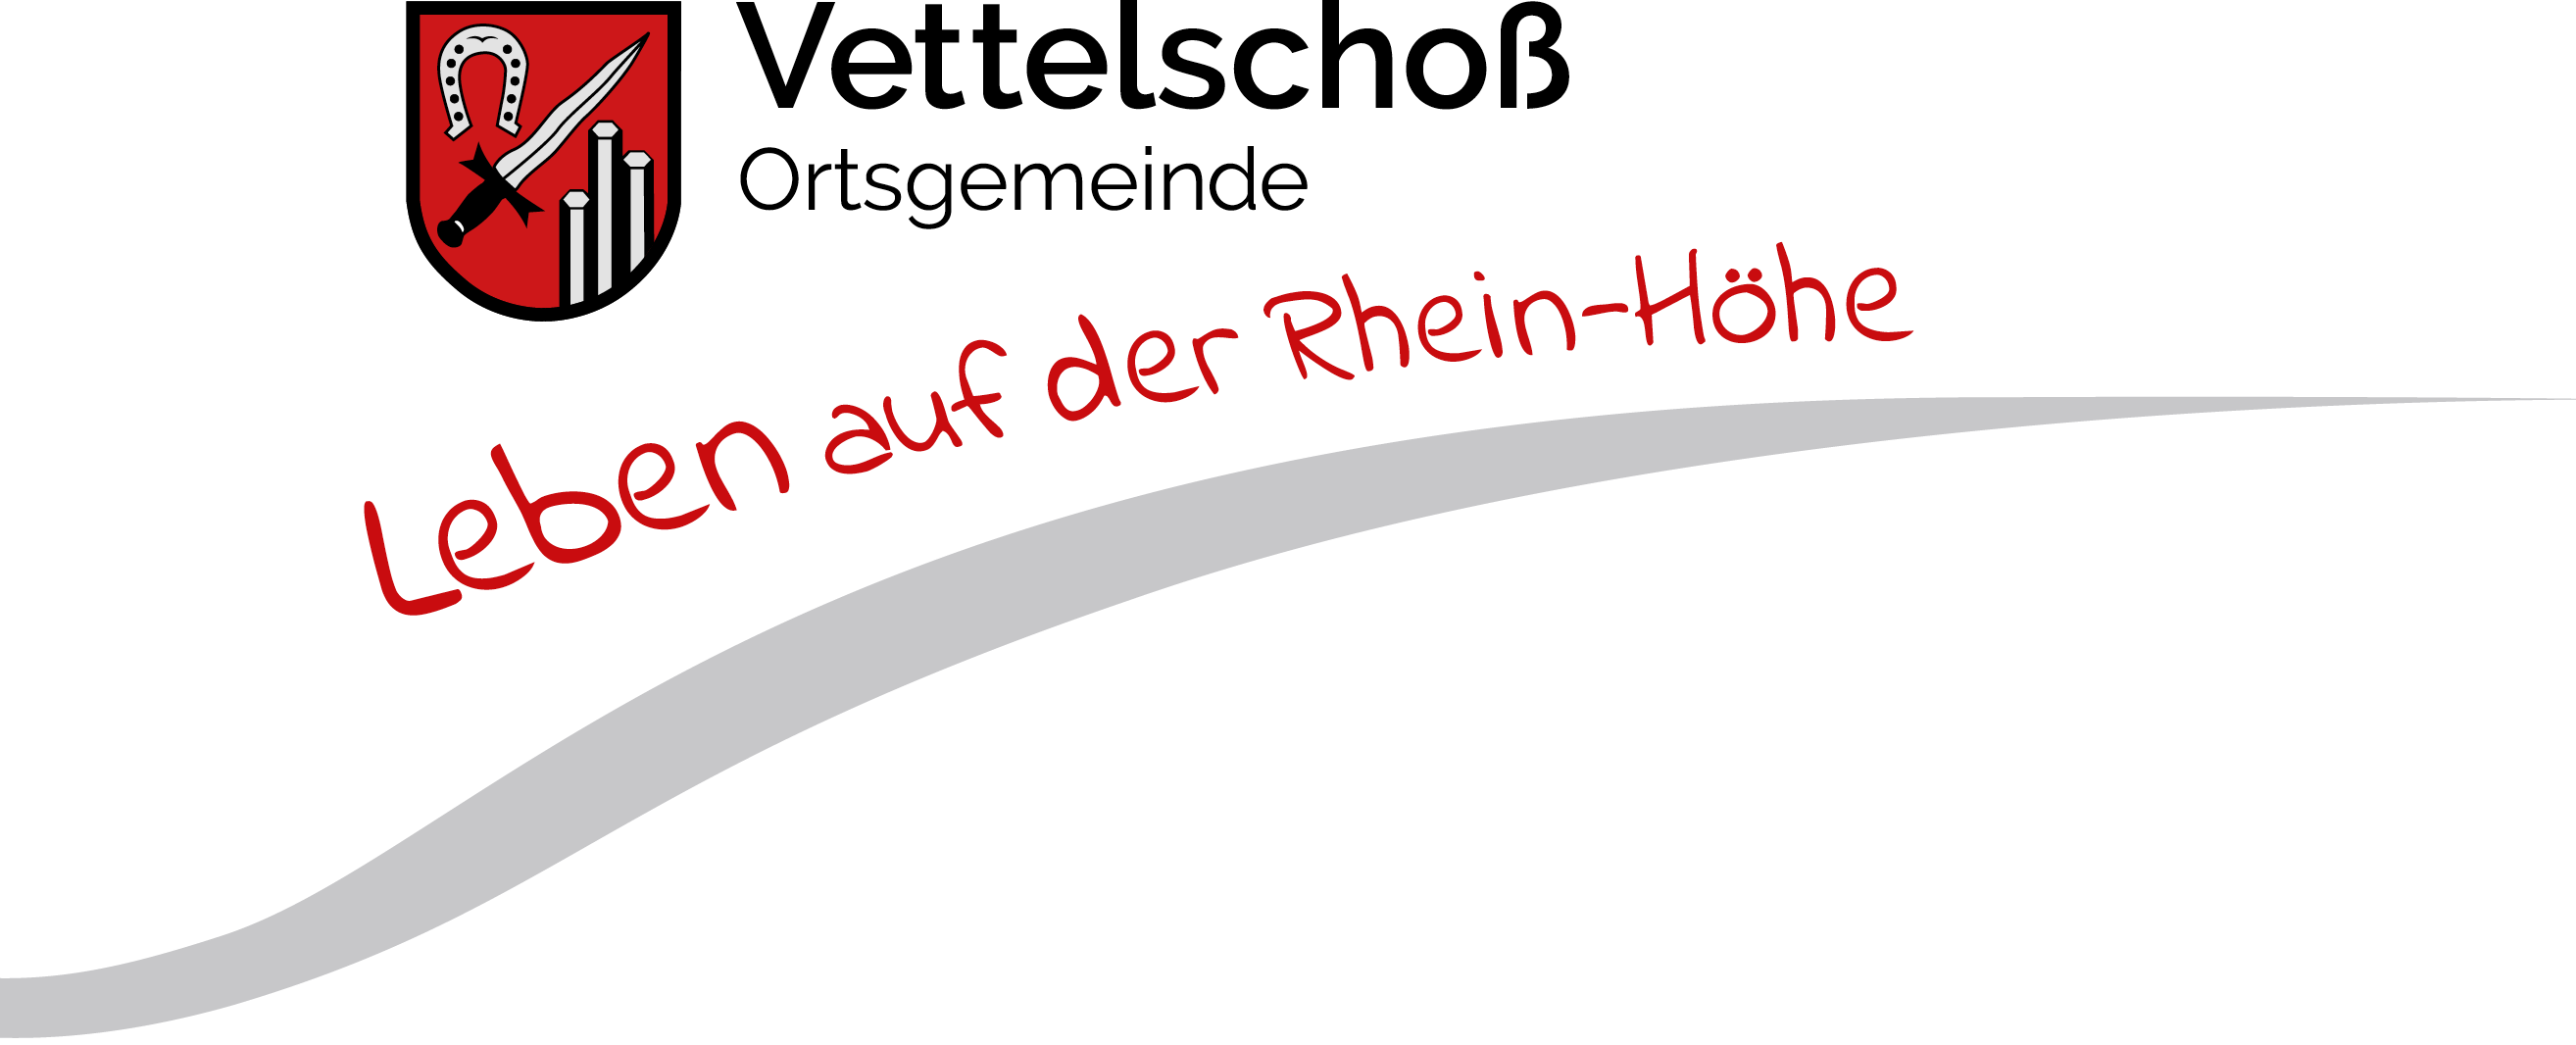 Ortsgemeinde Vettelschoß